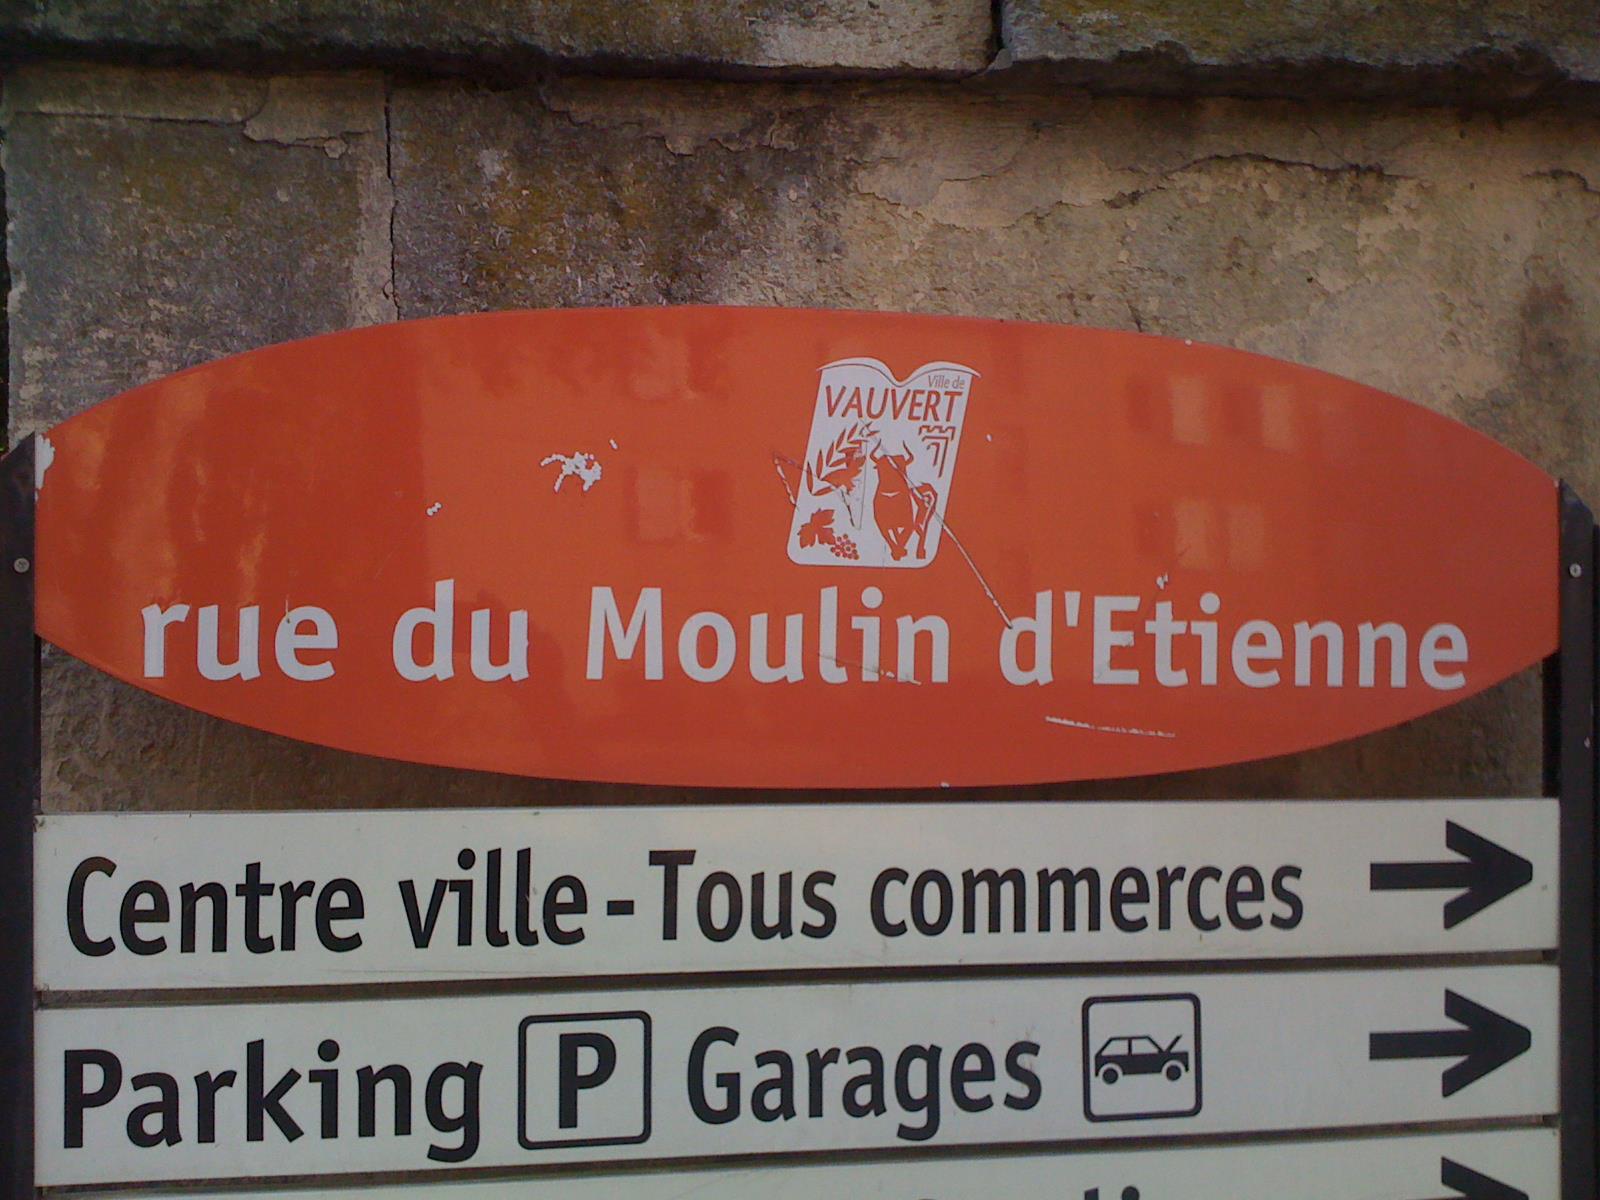 erwens rue du moulin d'etienne